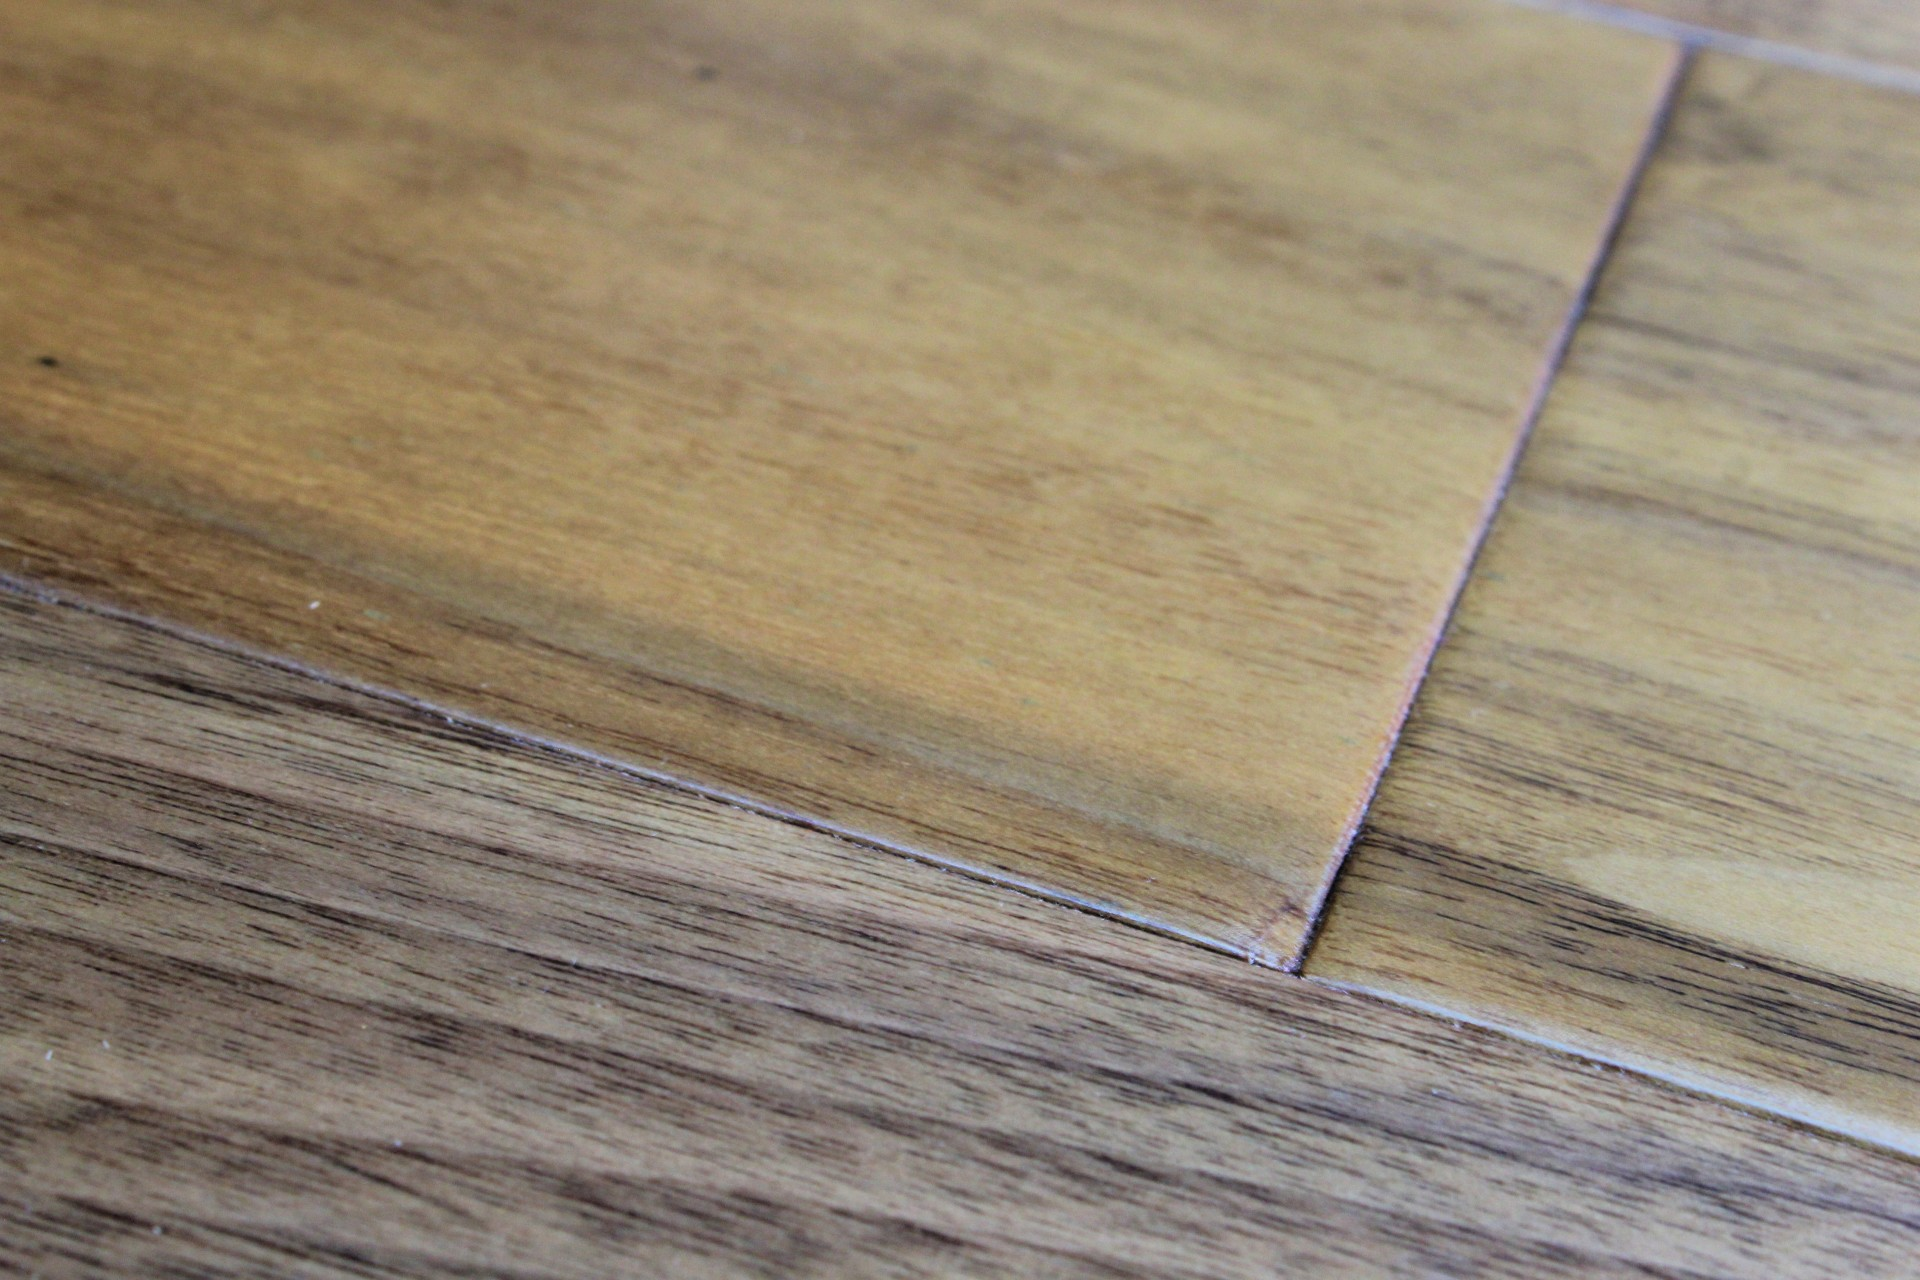 Hardwood, prefinished floor, engineered wood, solid wood, lifestyle, hard surface, prefinished hardwood, prefinished wood, home, design, interior design, wood floor design, urban floor